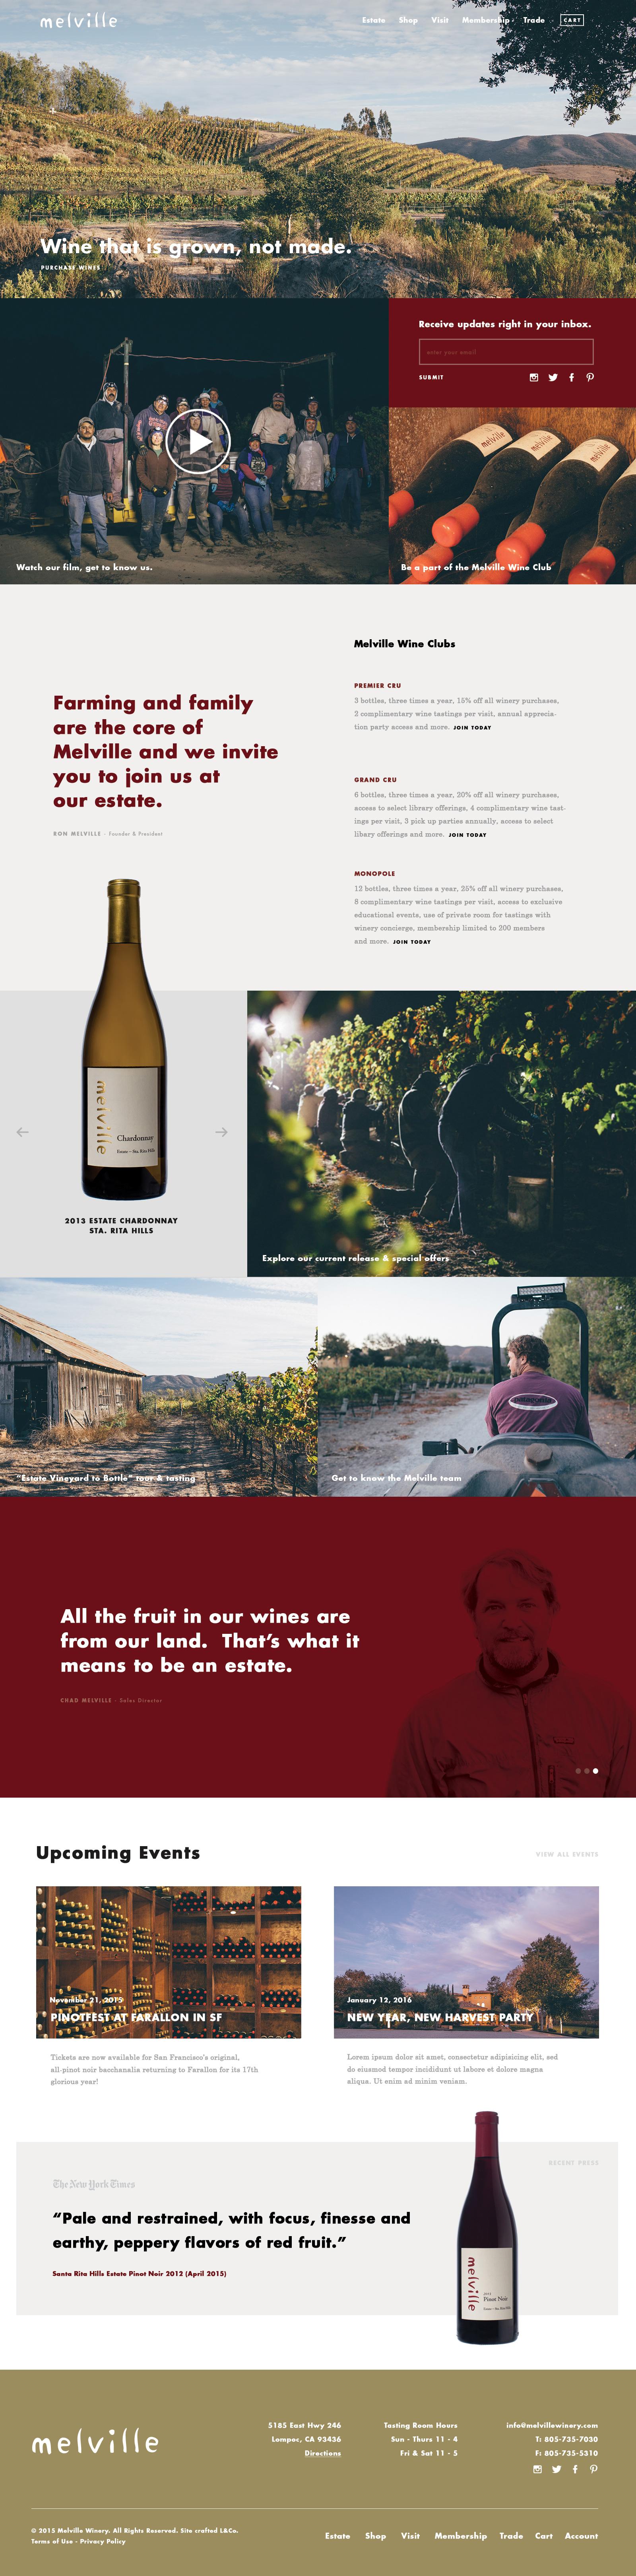 Leo-Basica-design-melville-winery-web-design2